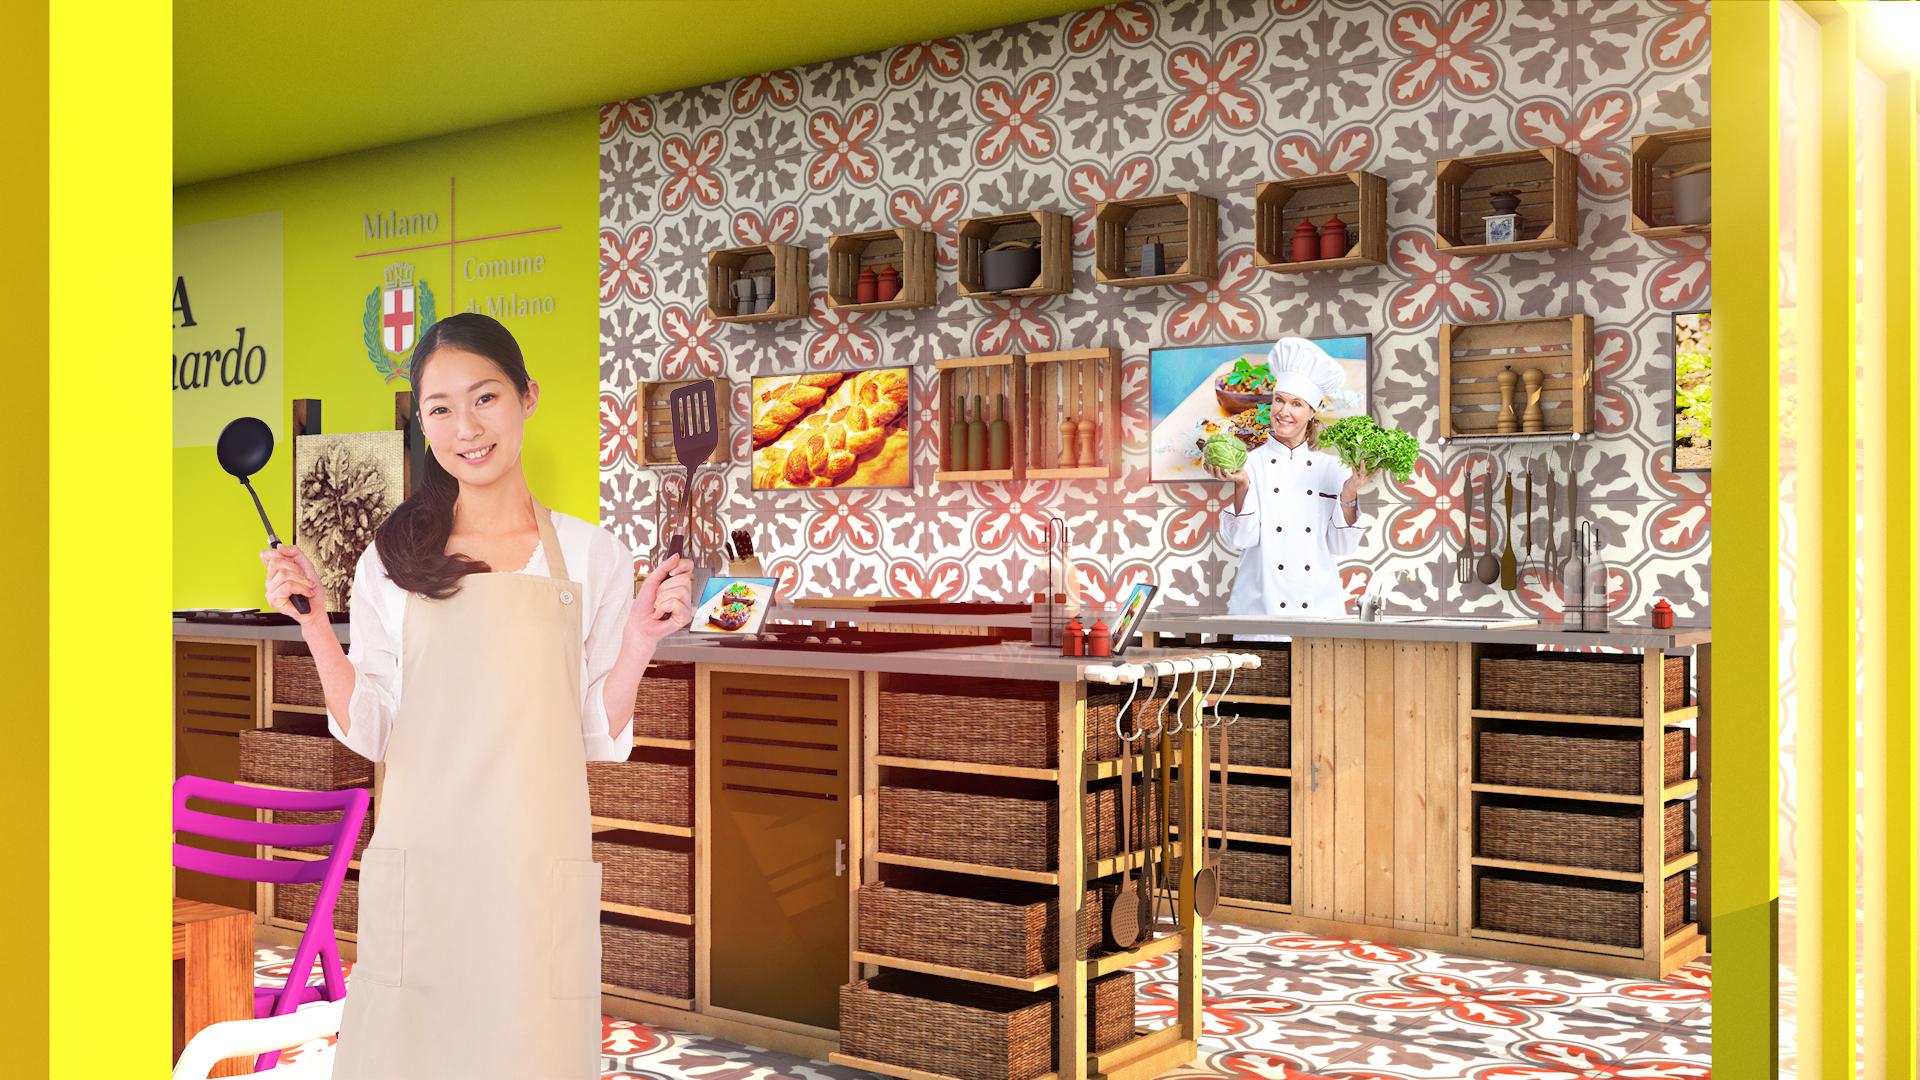 Leonardo Museum / kitchen